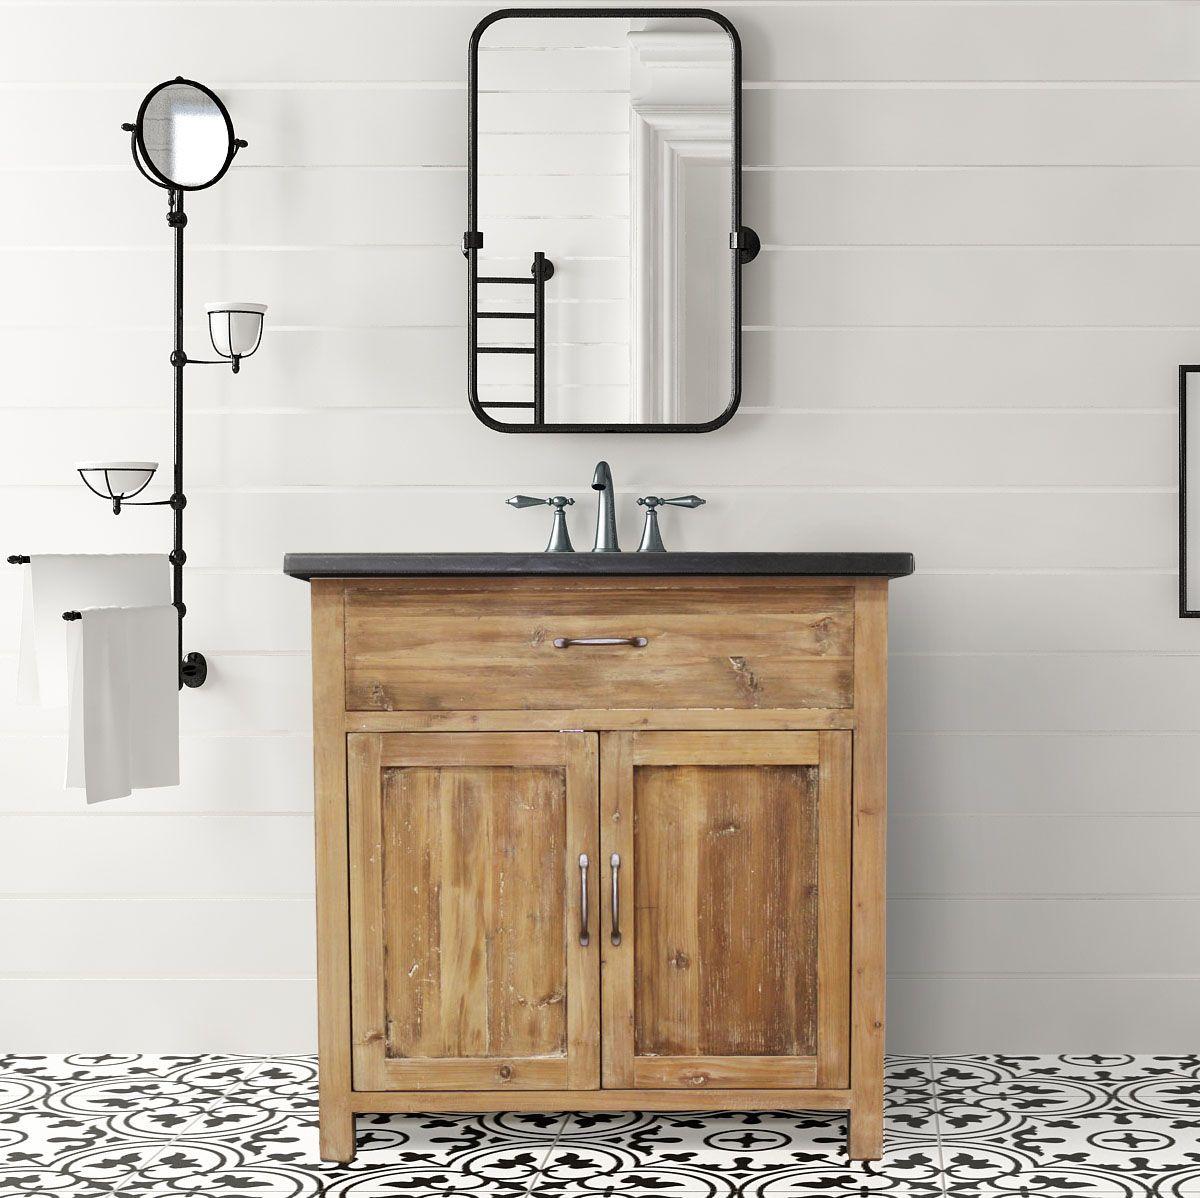 36 Woodland Bluestone Natural Pine Antique Bathroom Vanity Bathroom Vanity Bathroom Vanities For Sale